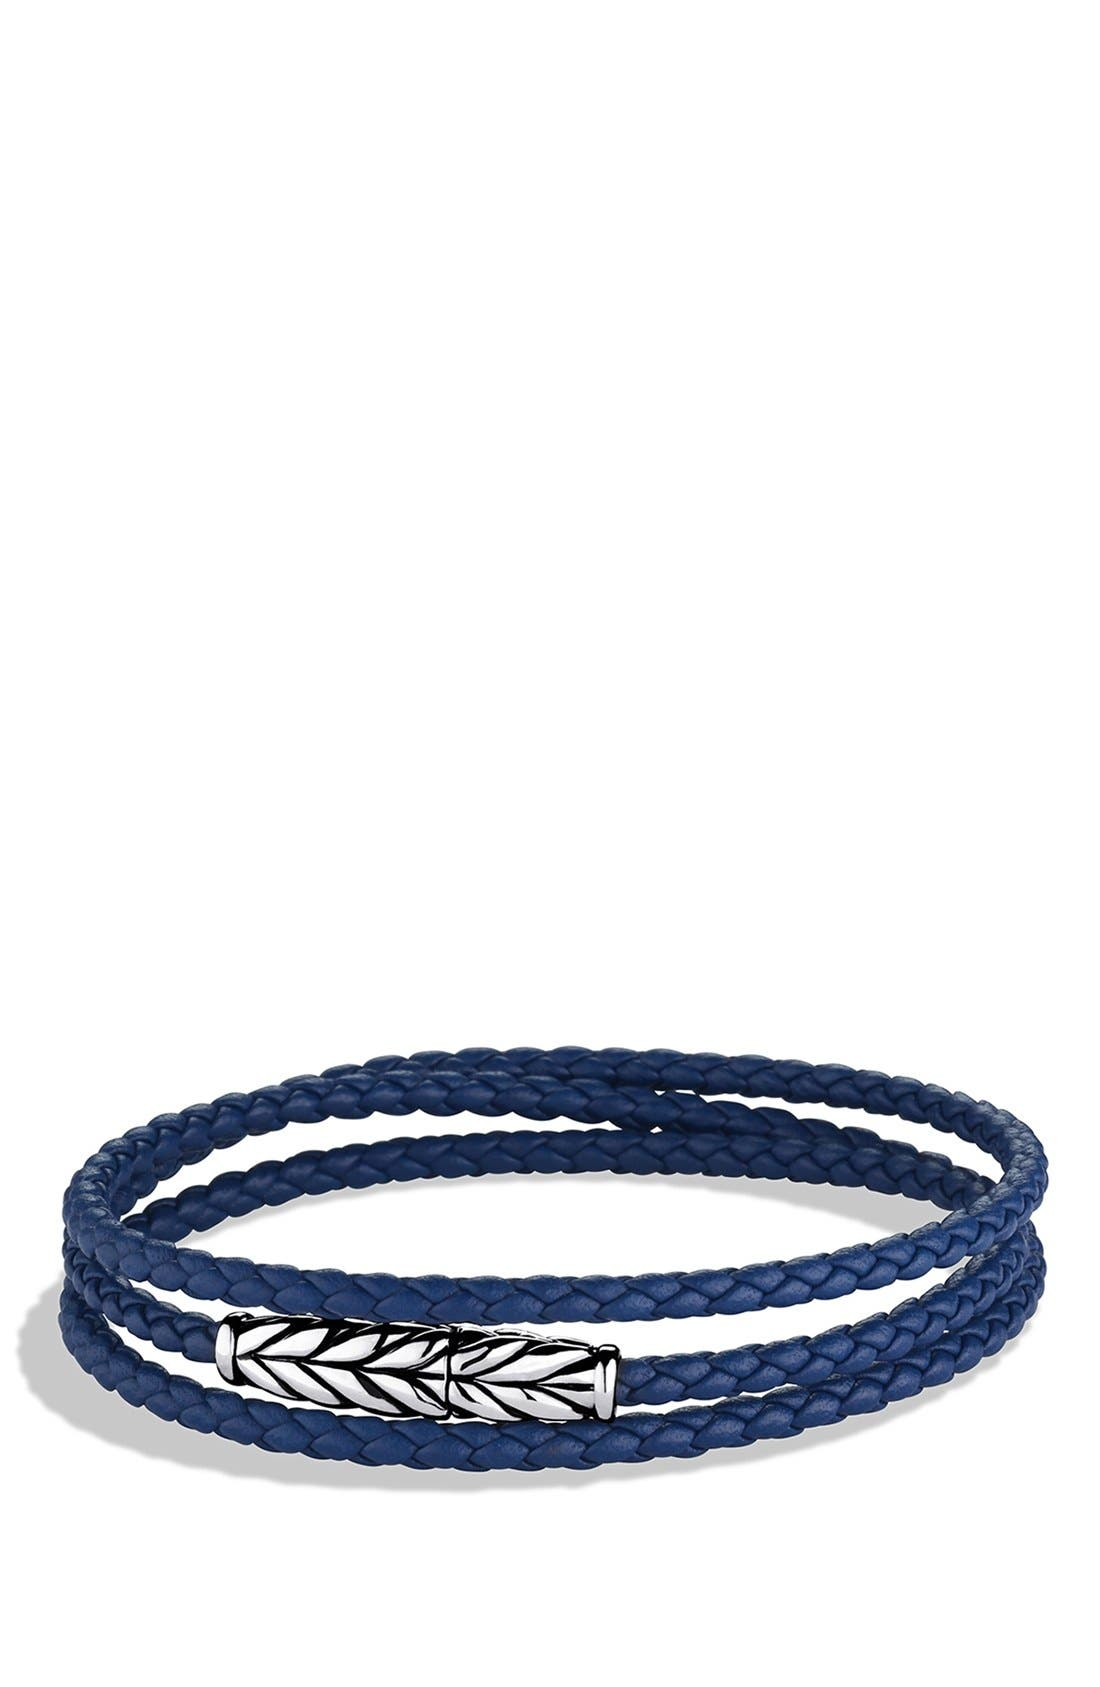 'Chevron' Triple-Wrap Bracelet,                             Main thumbnail 1, color,                             Blue